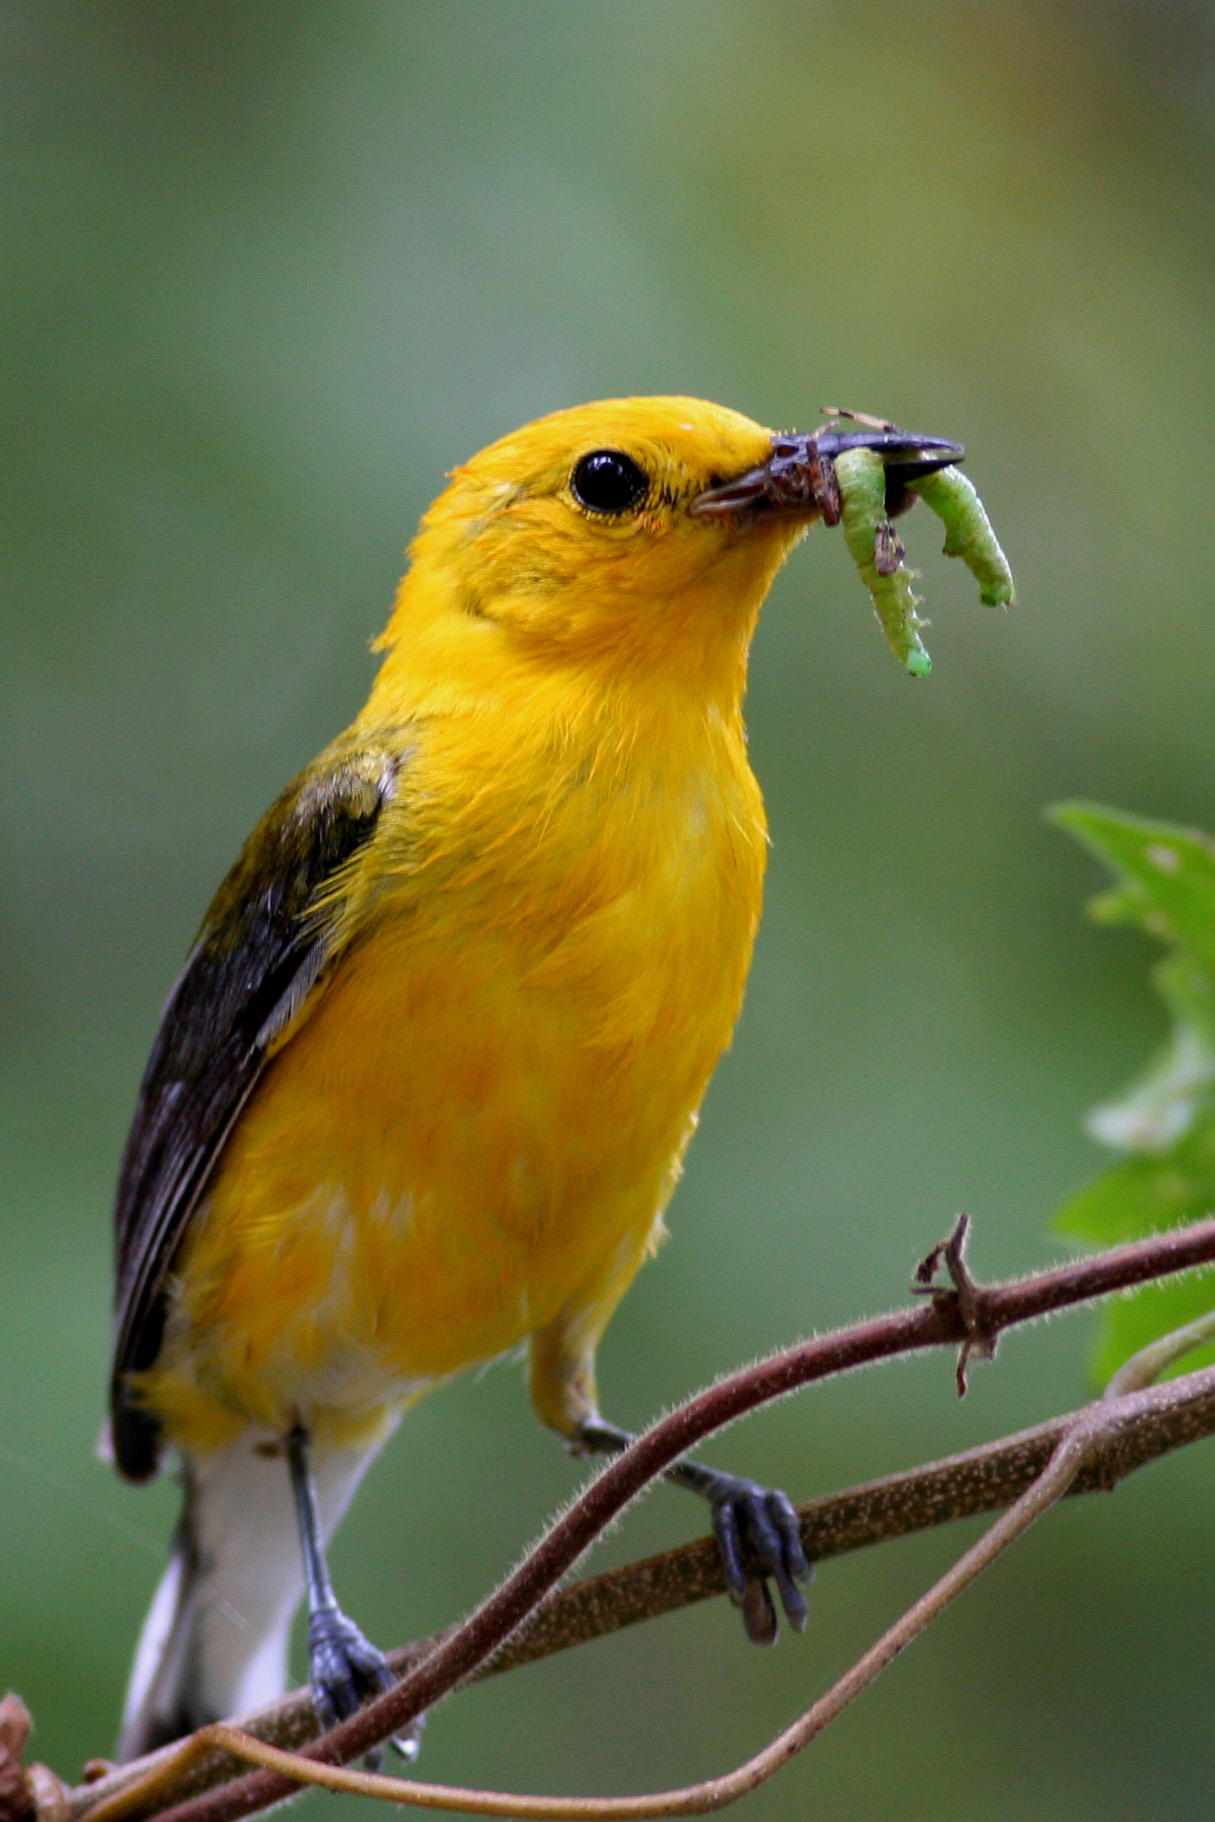 Bright yellow, alert-looking daddy bird with bright green caterpillar in beak.